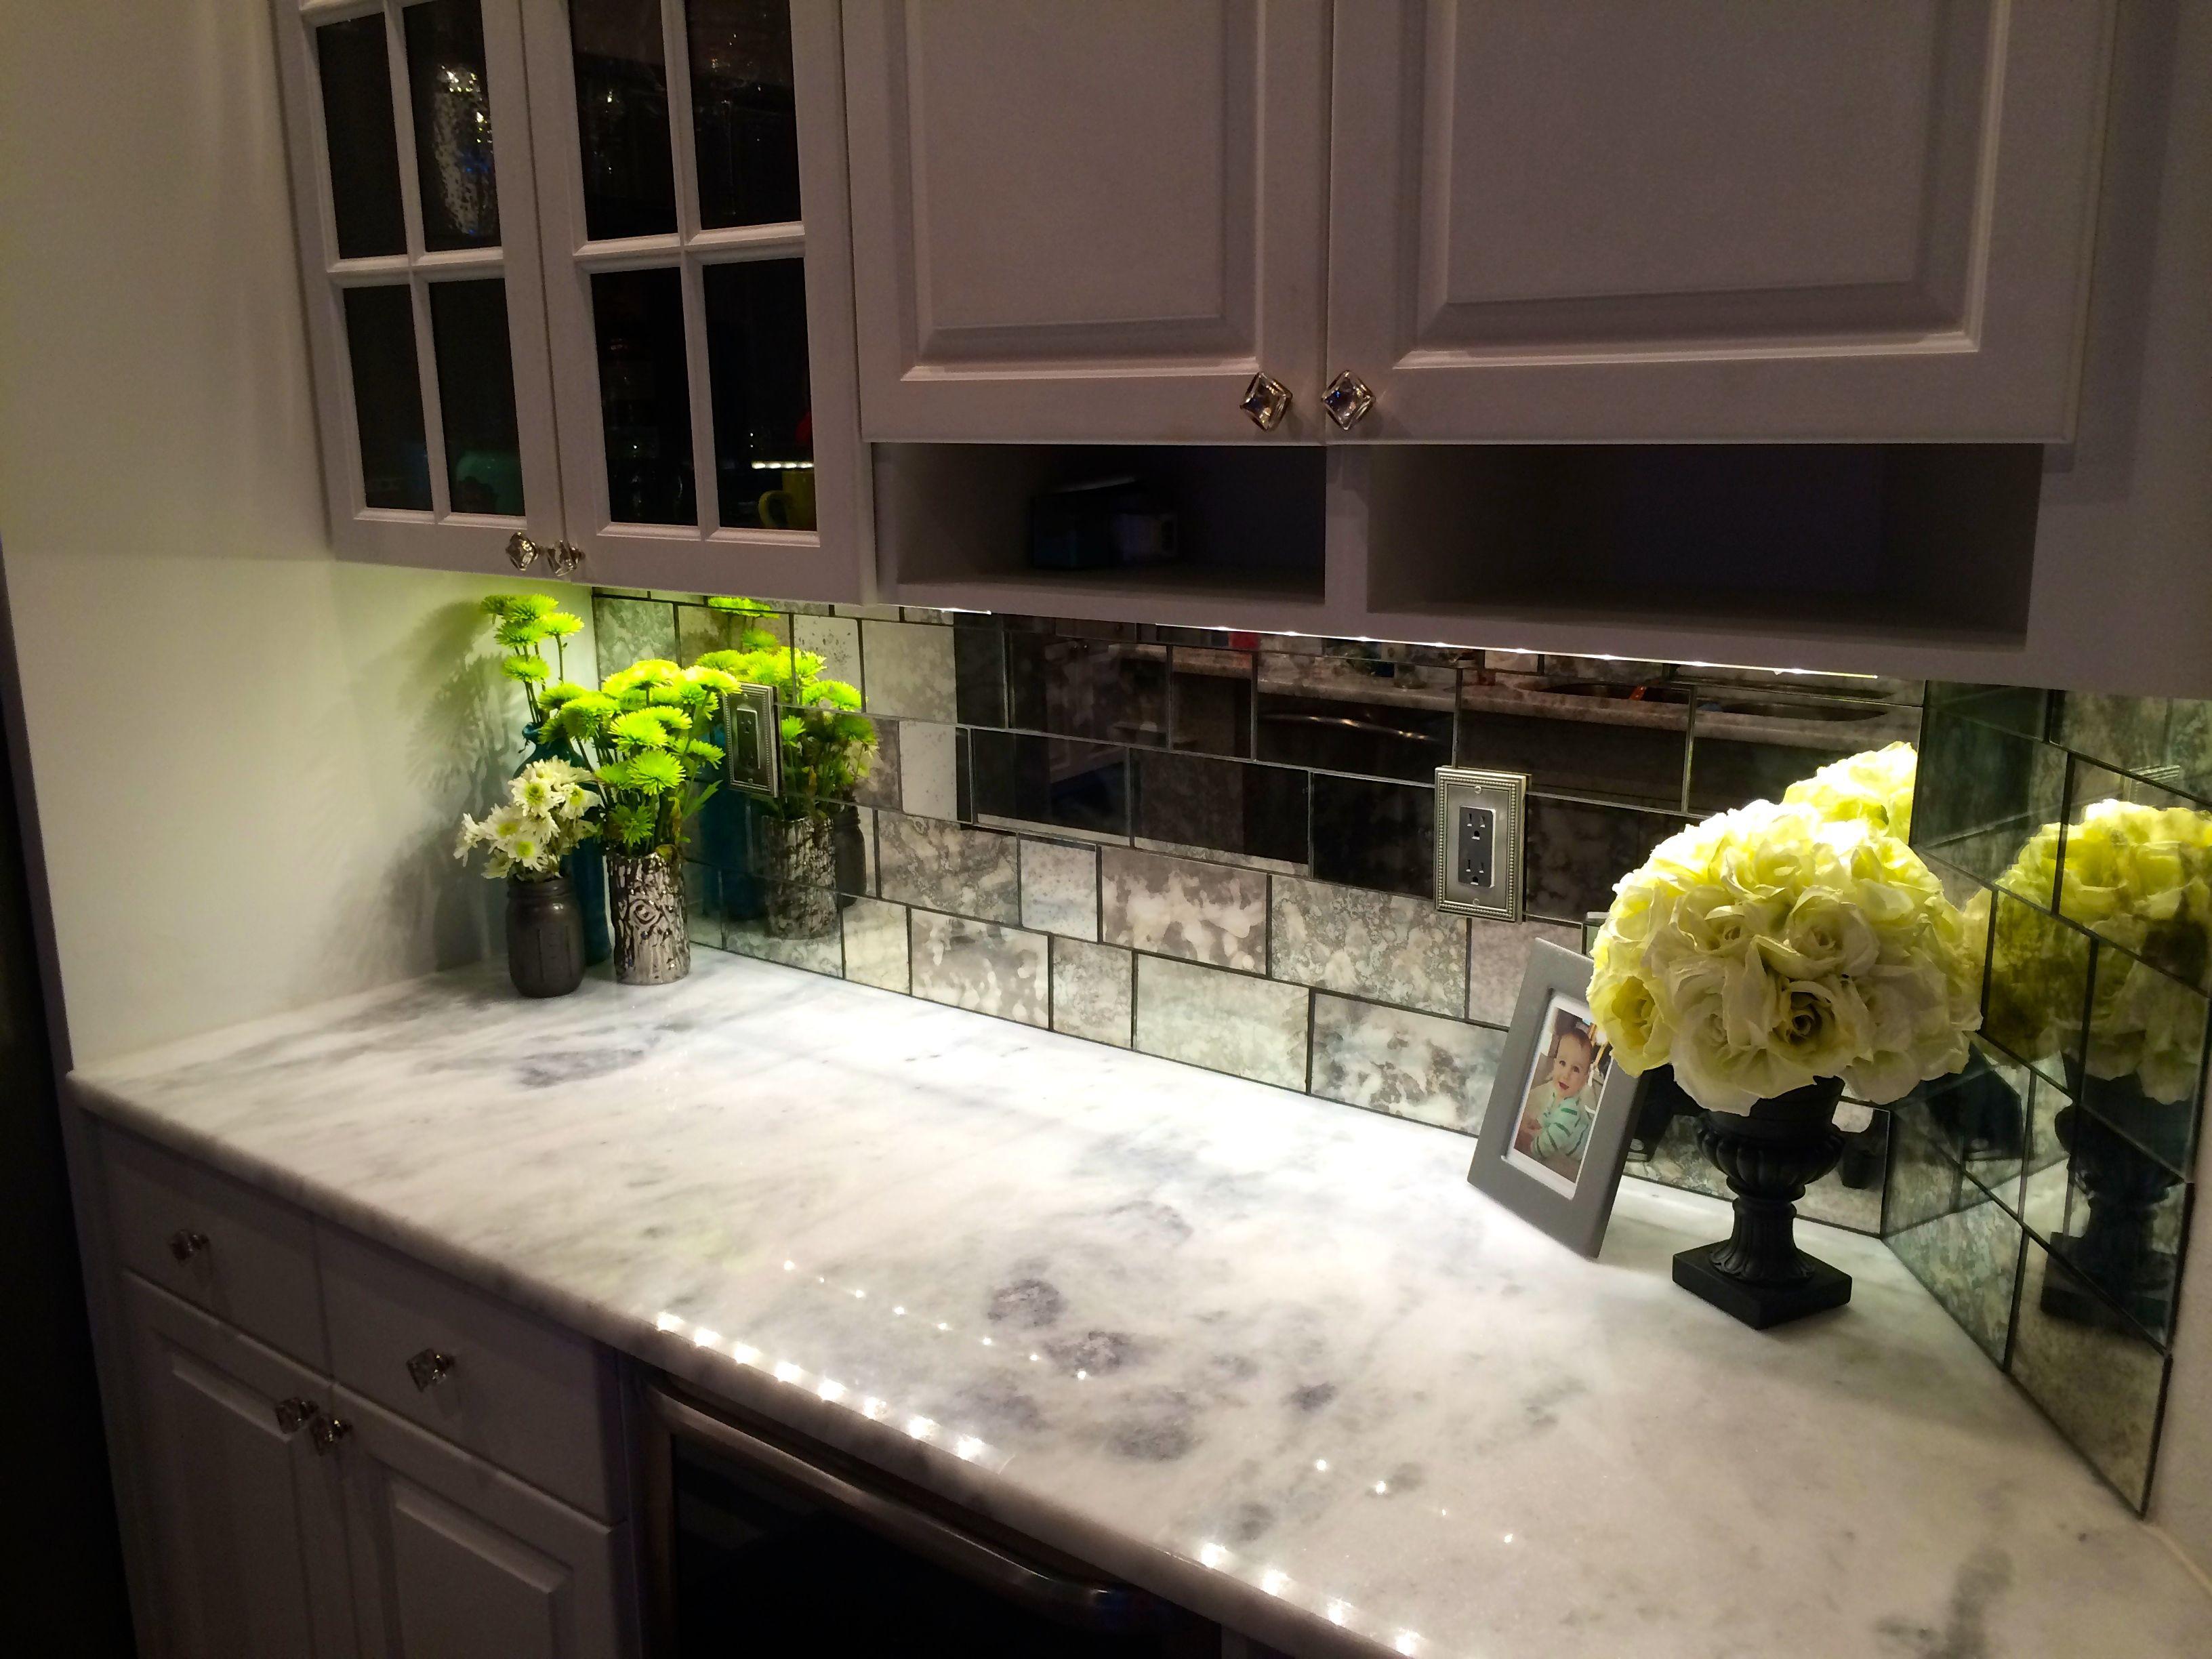 Dazzling Mirrored Tile Backsplash For Interior Decoration